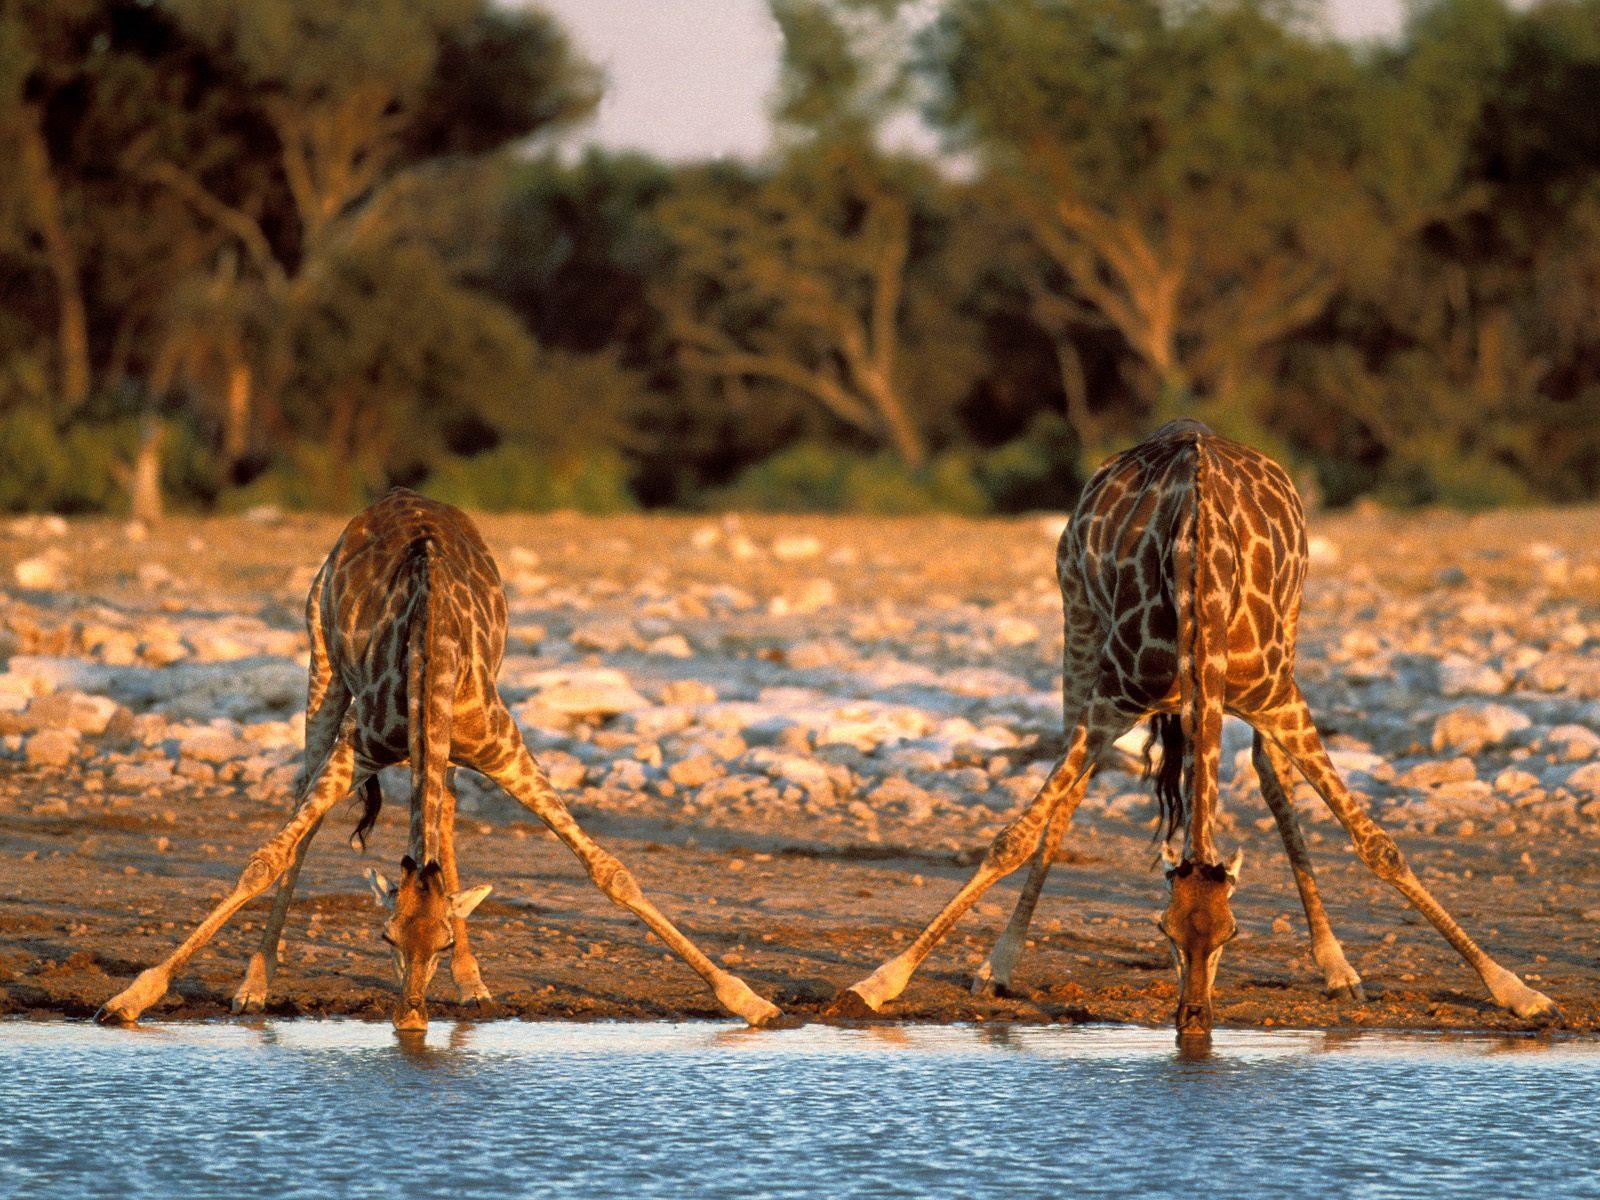 http://1.bp.blogspot.com/-ovZyP4WOxZc/TppKXdoHWVI/AAAAAAAAH48/LiWbpSHeLFY/s1600/kruger-national-park-south-afrika-4.jpg